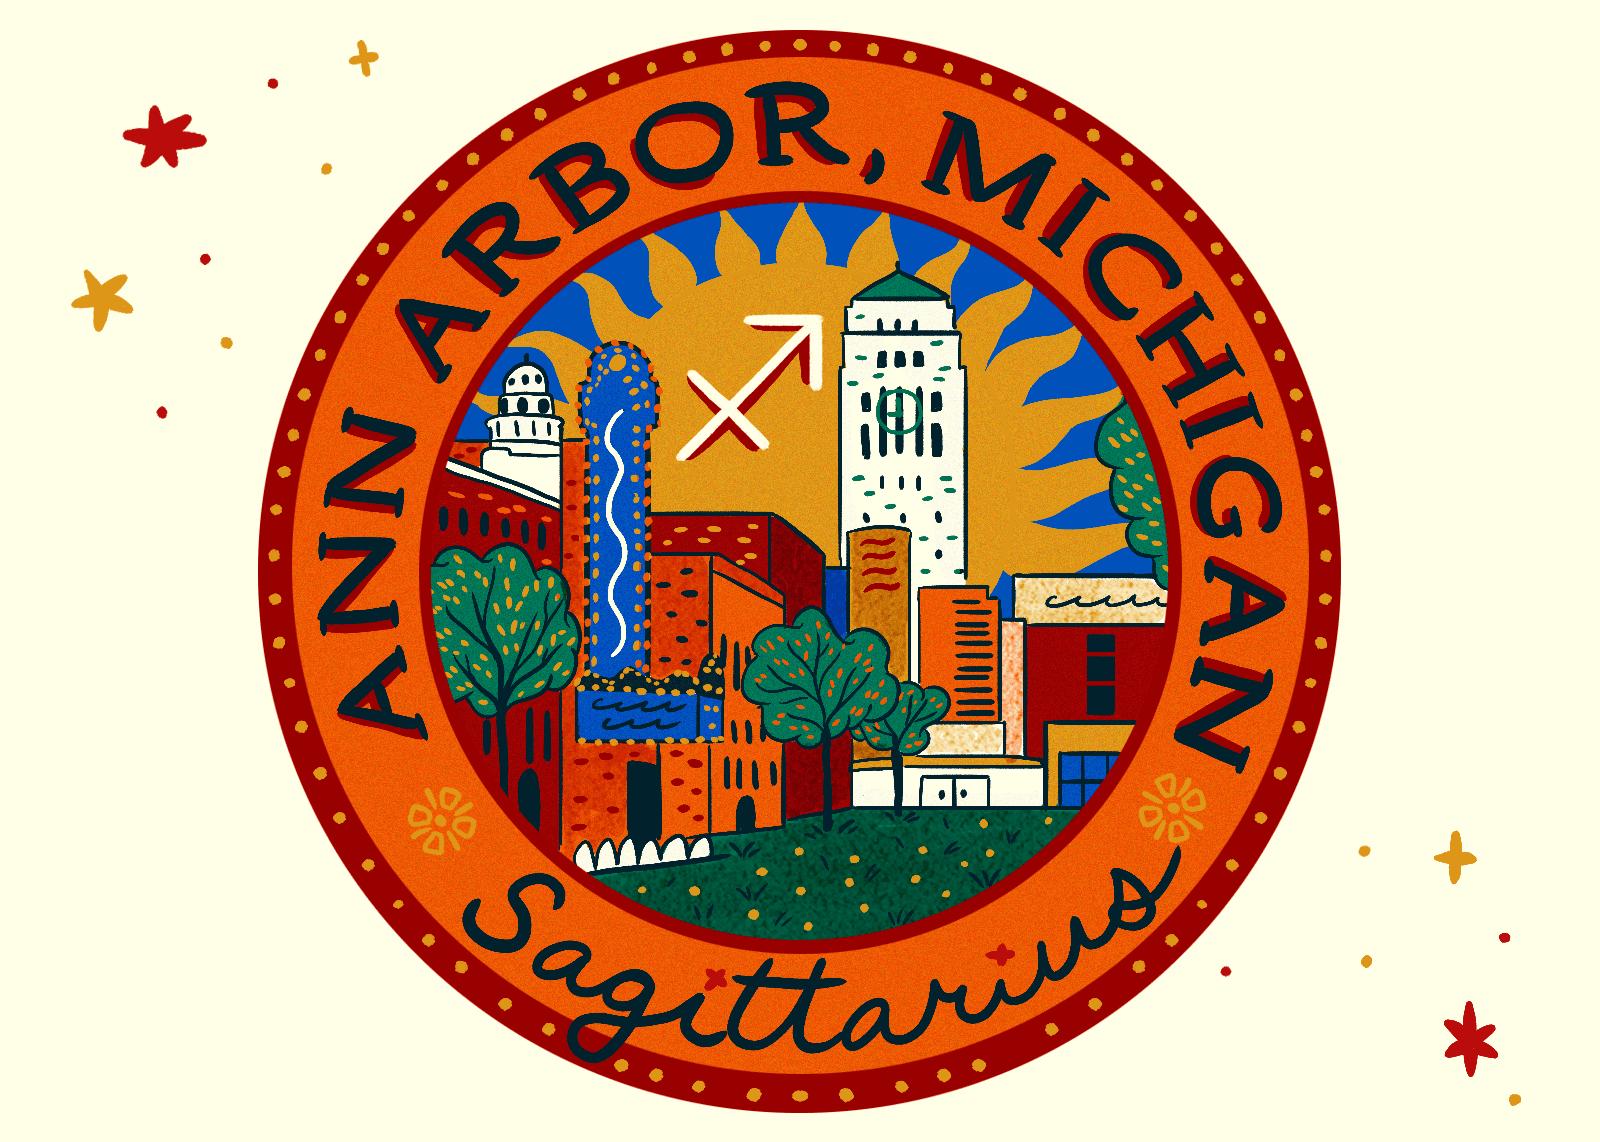 Illustration of Ann Arbor, Michigan